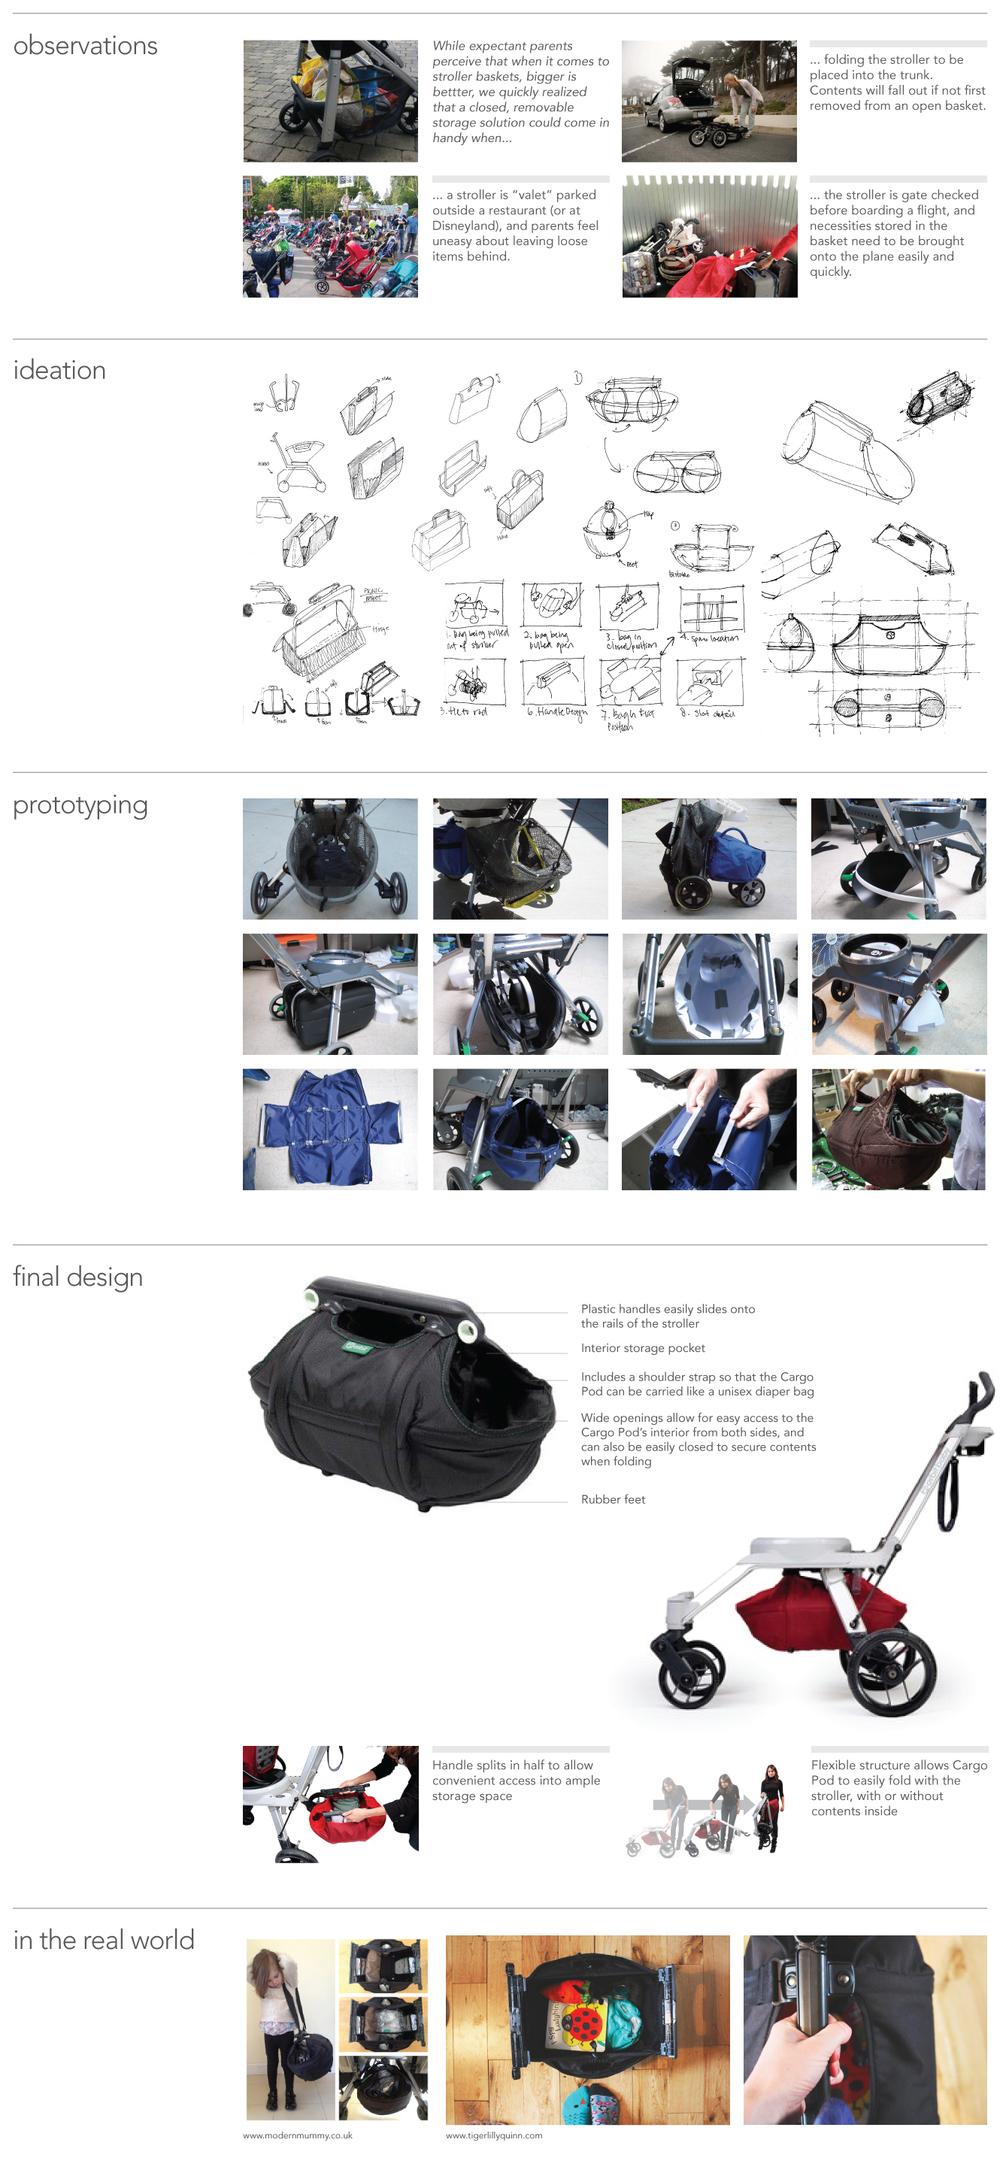 HoisterPortfolio_Cargo-Pod-Layout.jpg